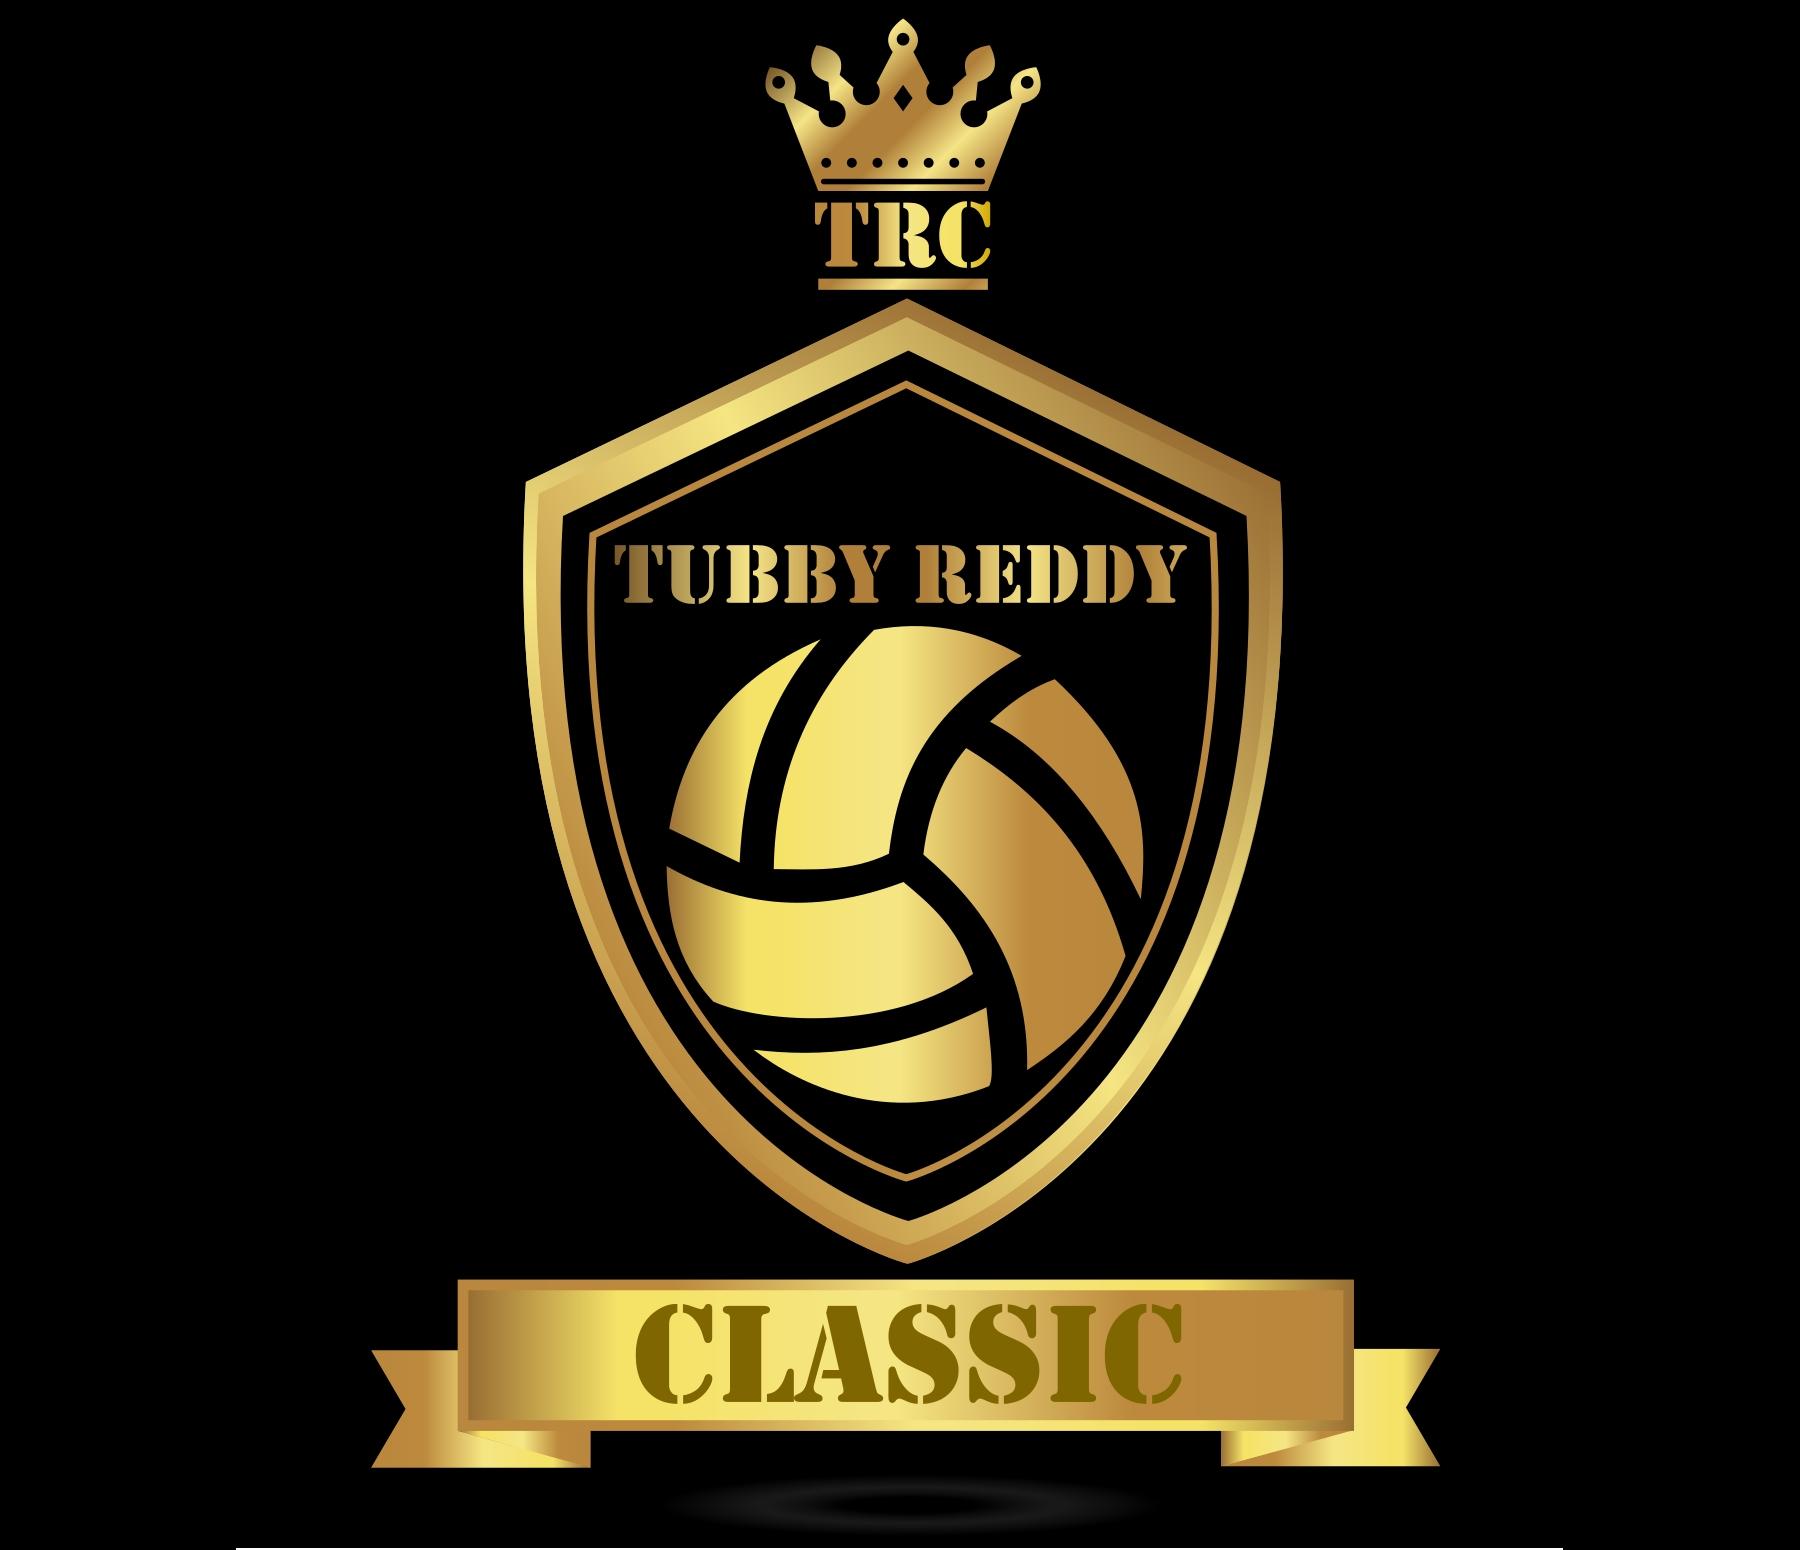 Tubby Reddy Classic